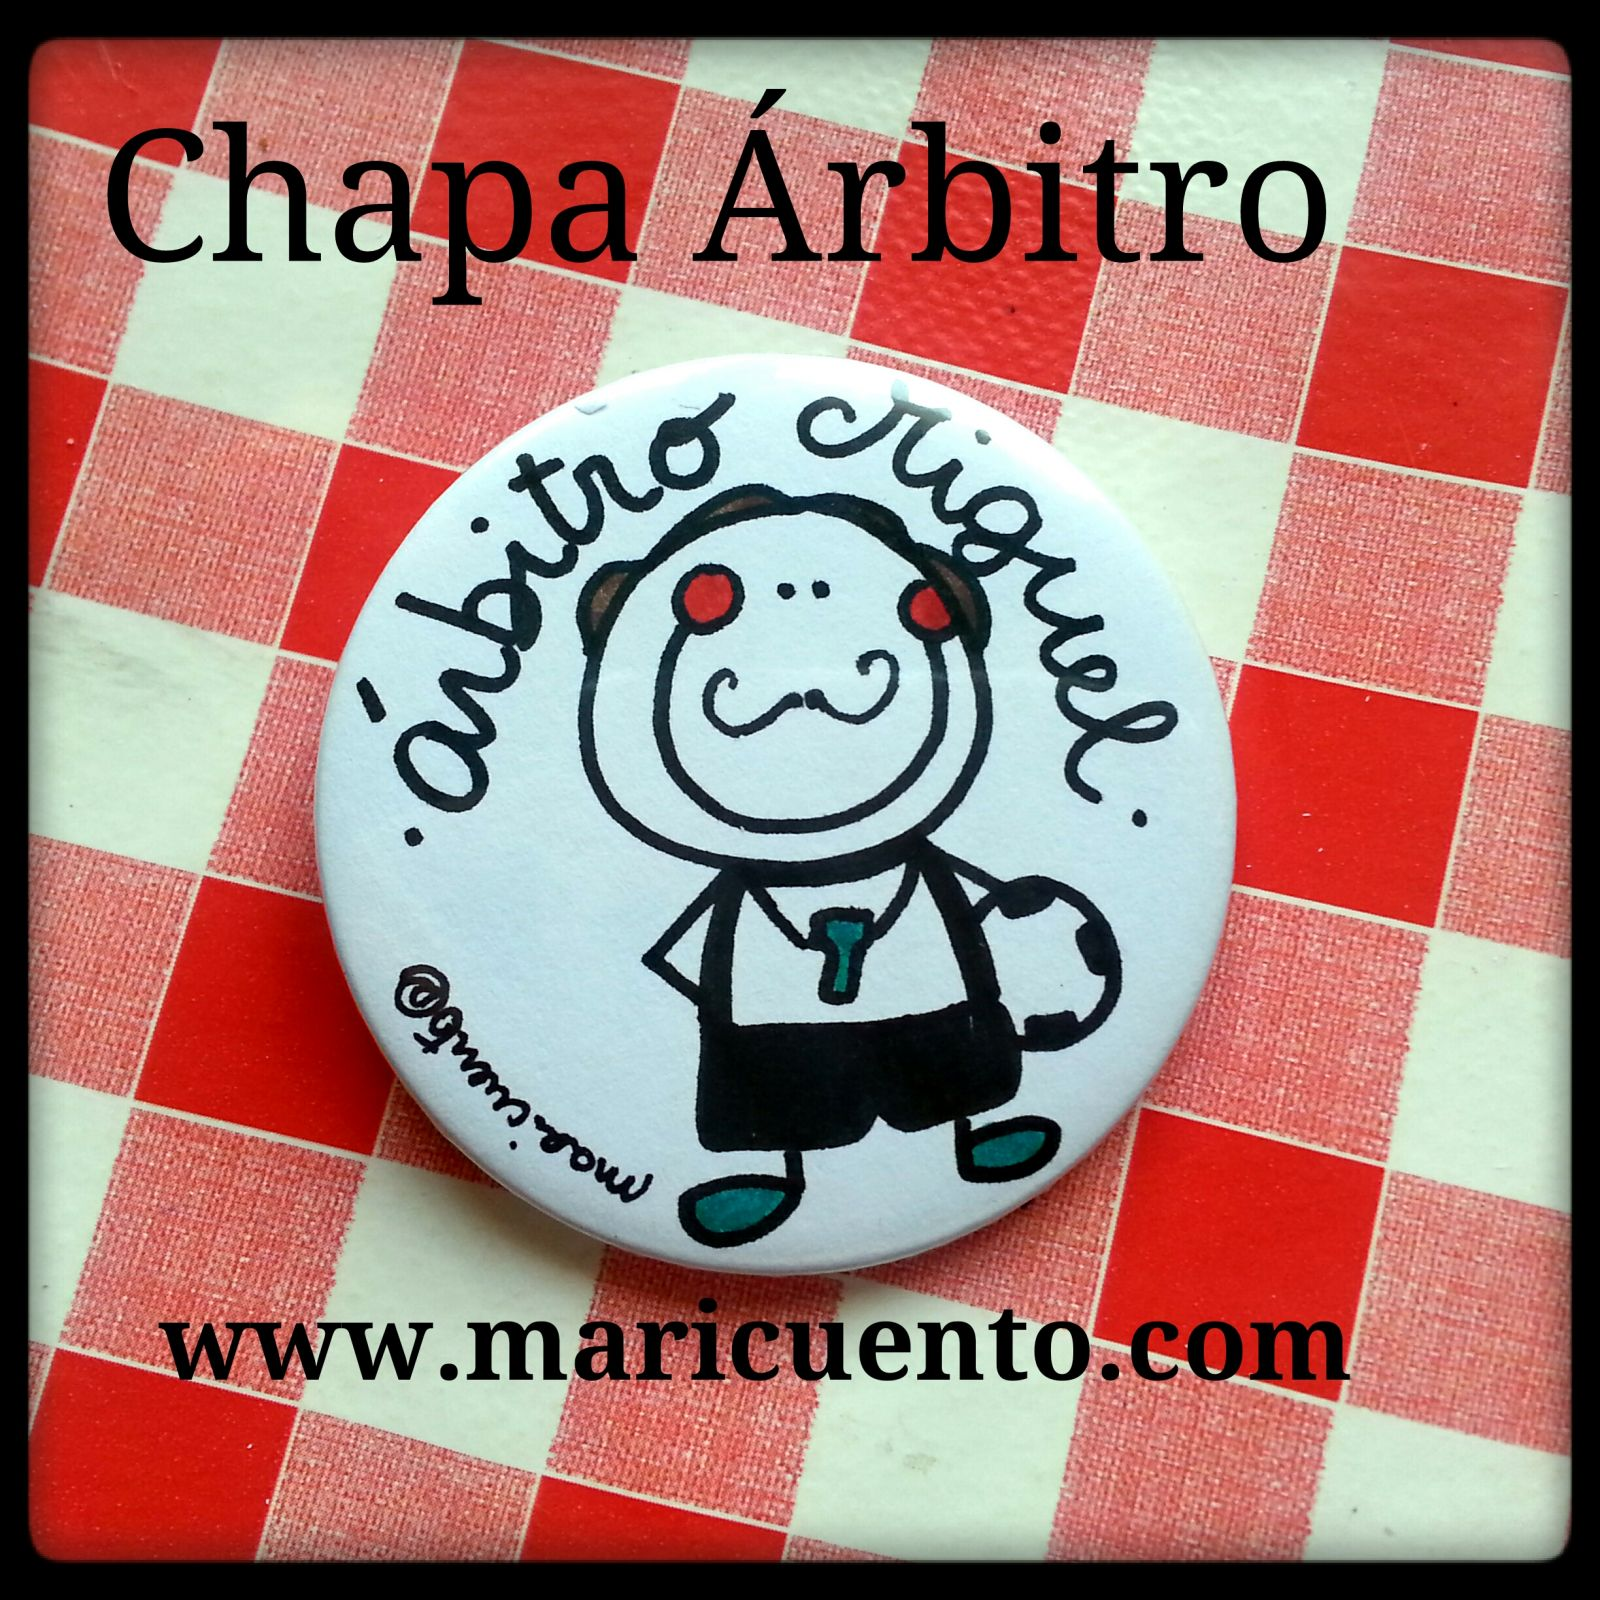 Chapa Árbitro